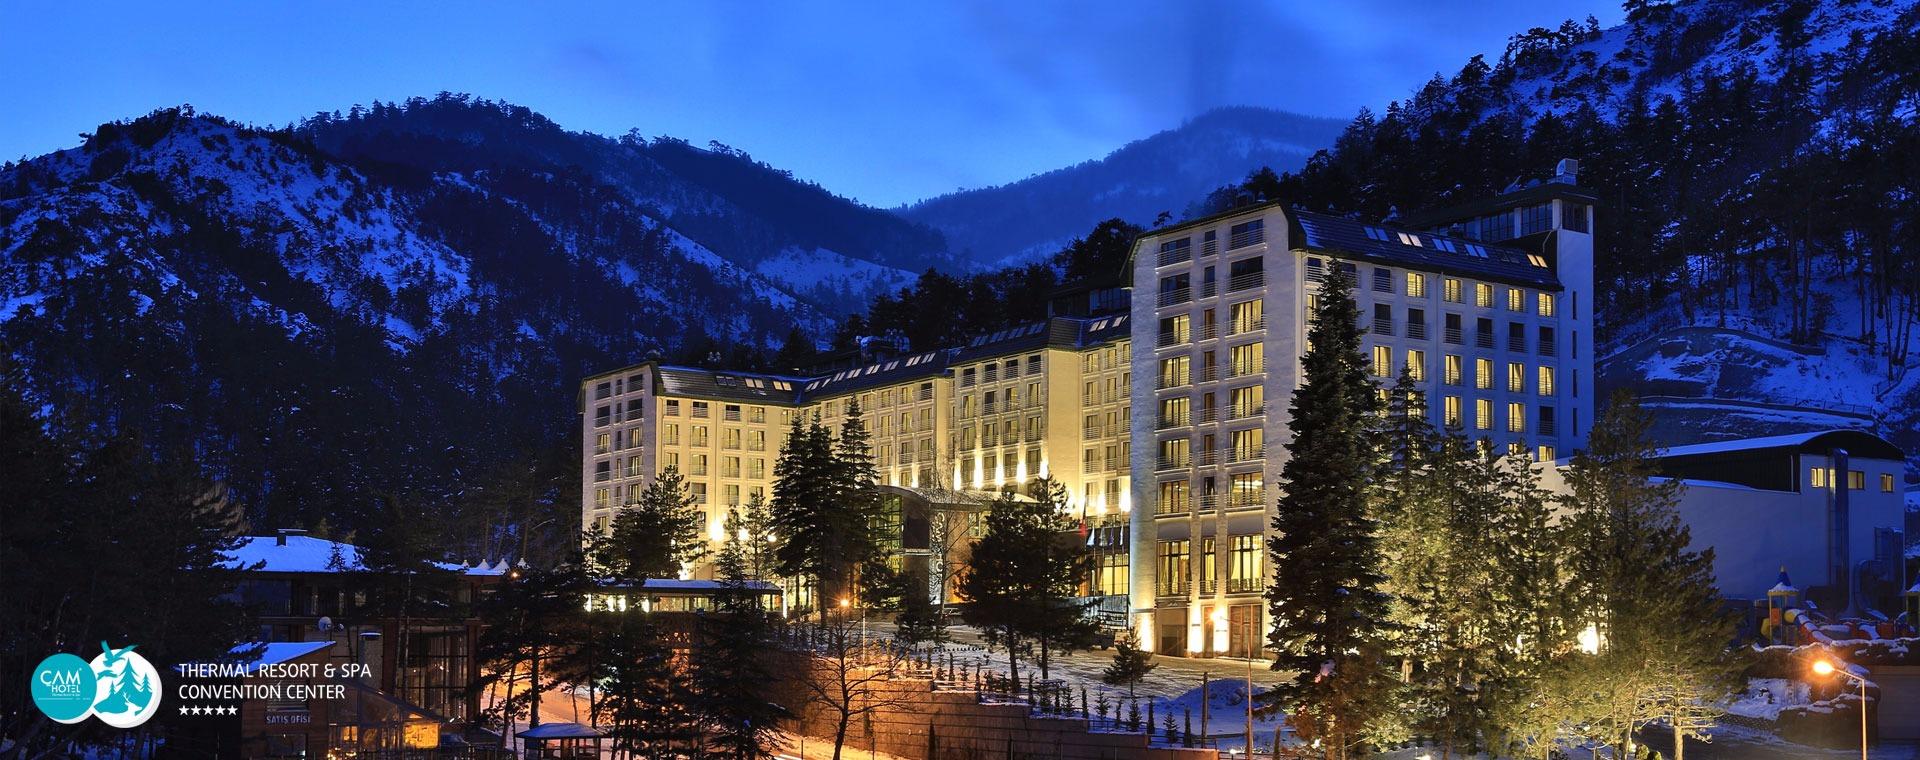 ÇAM HOTEL TERMAL RESORT&SPA46320